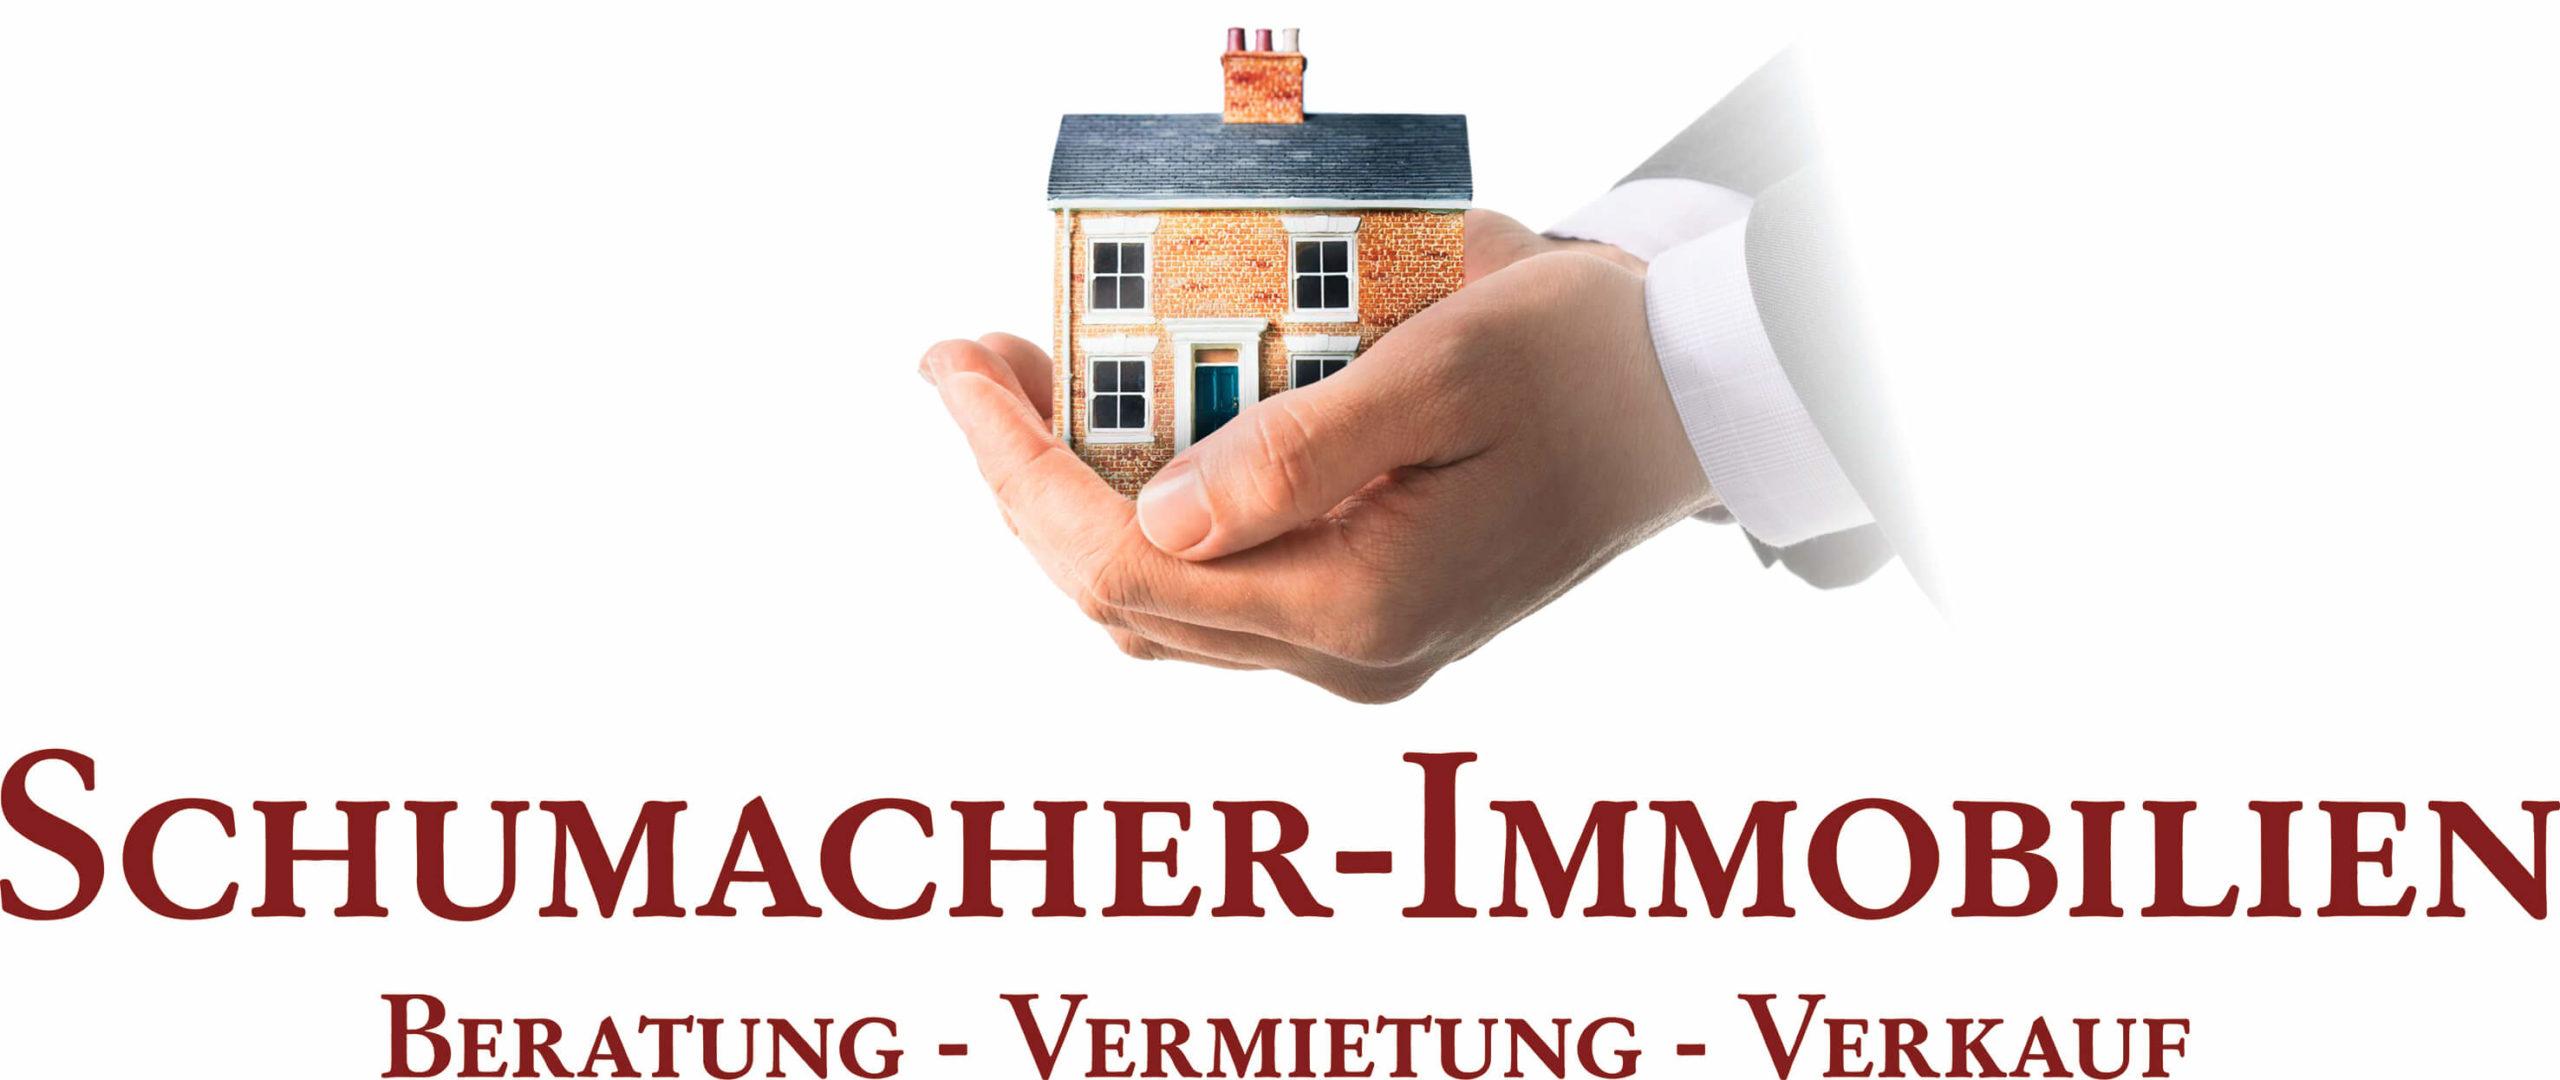 Schumacher-Immobilien